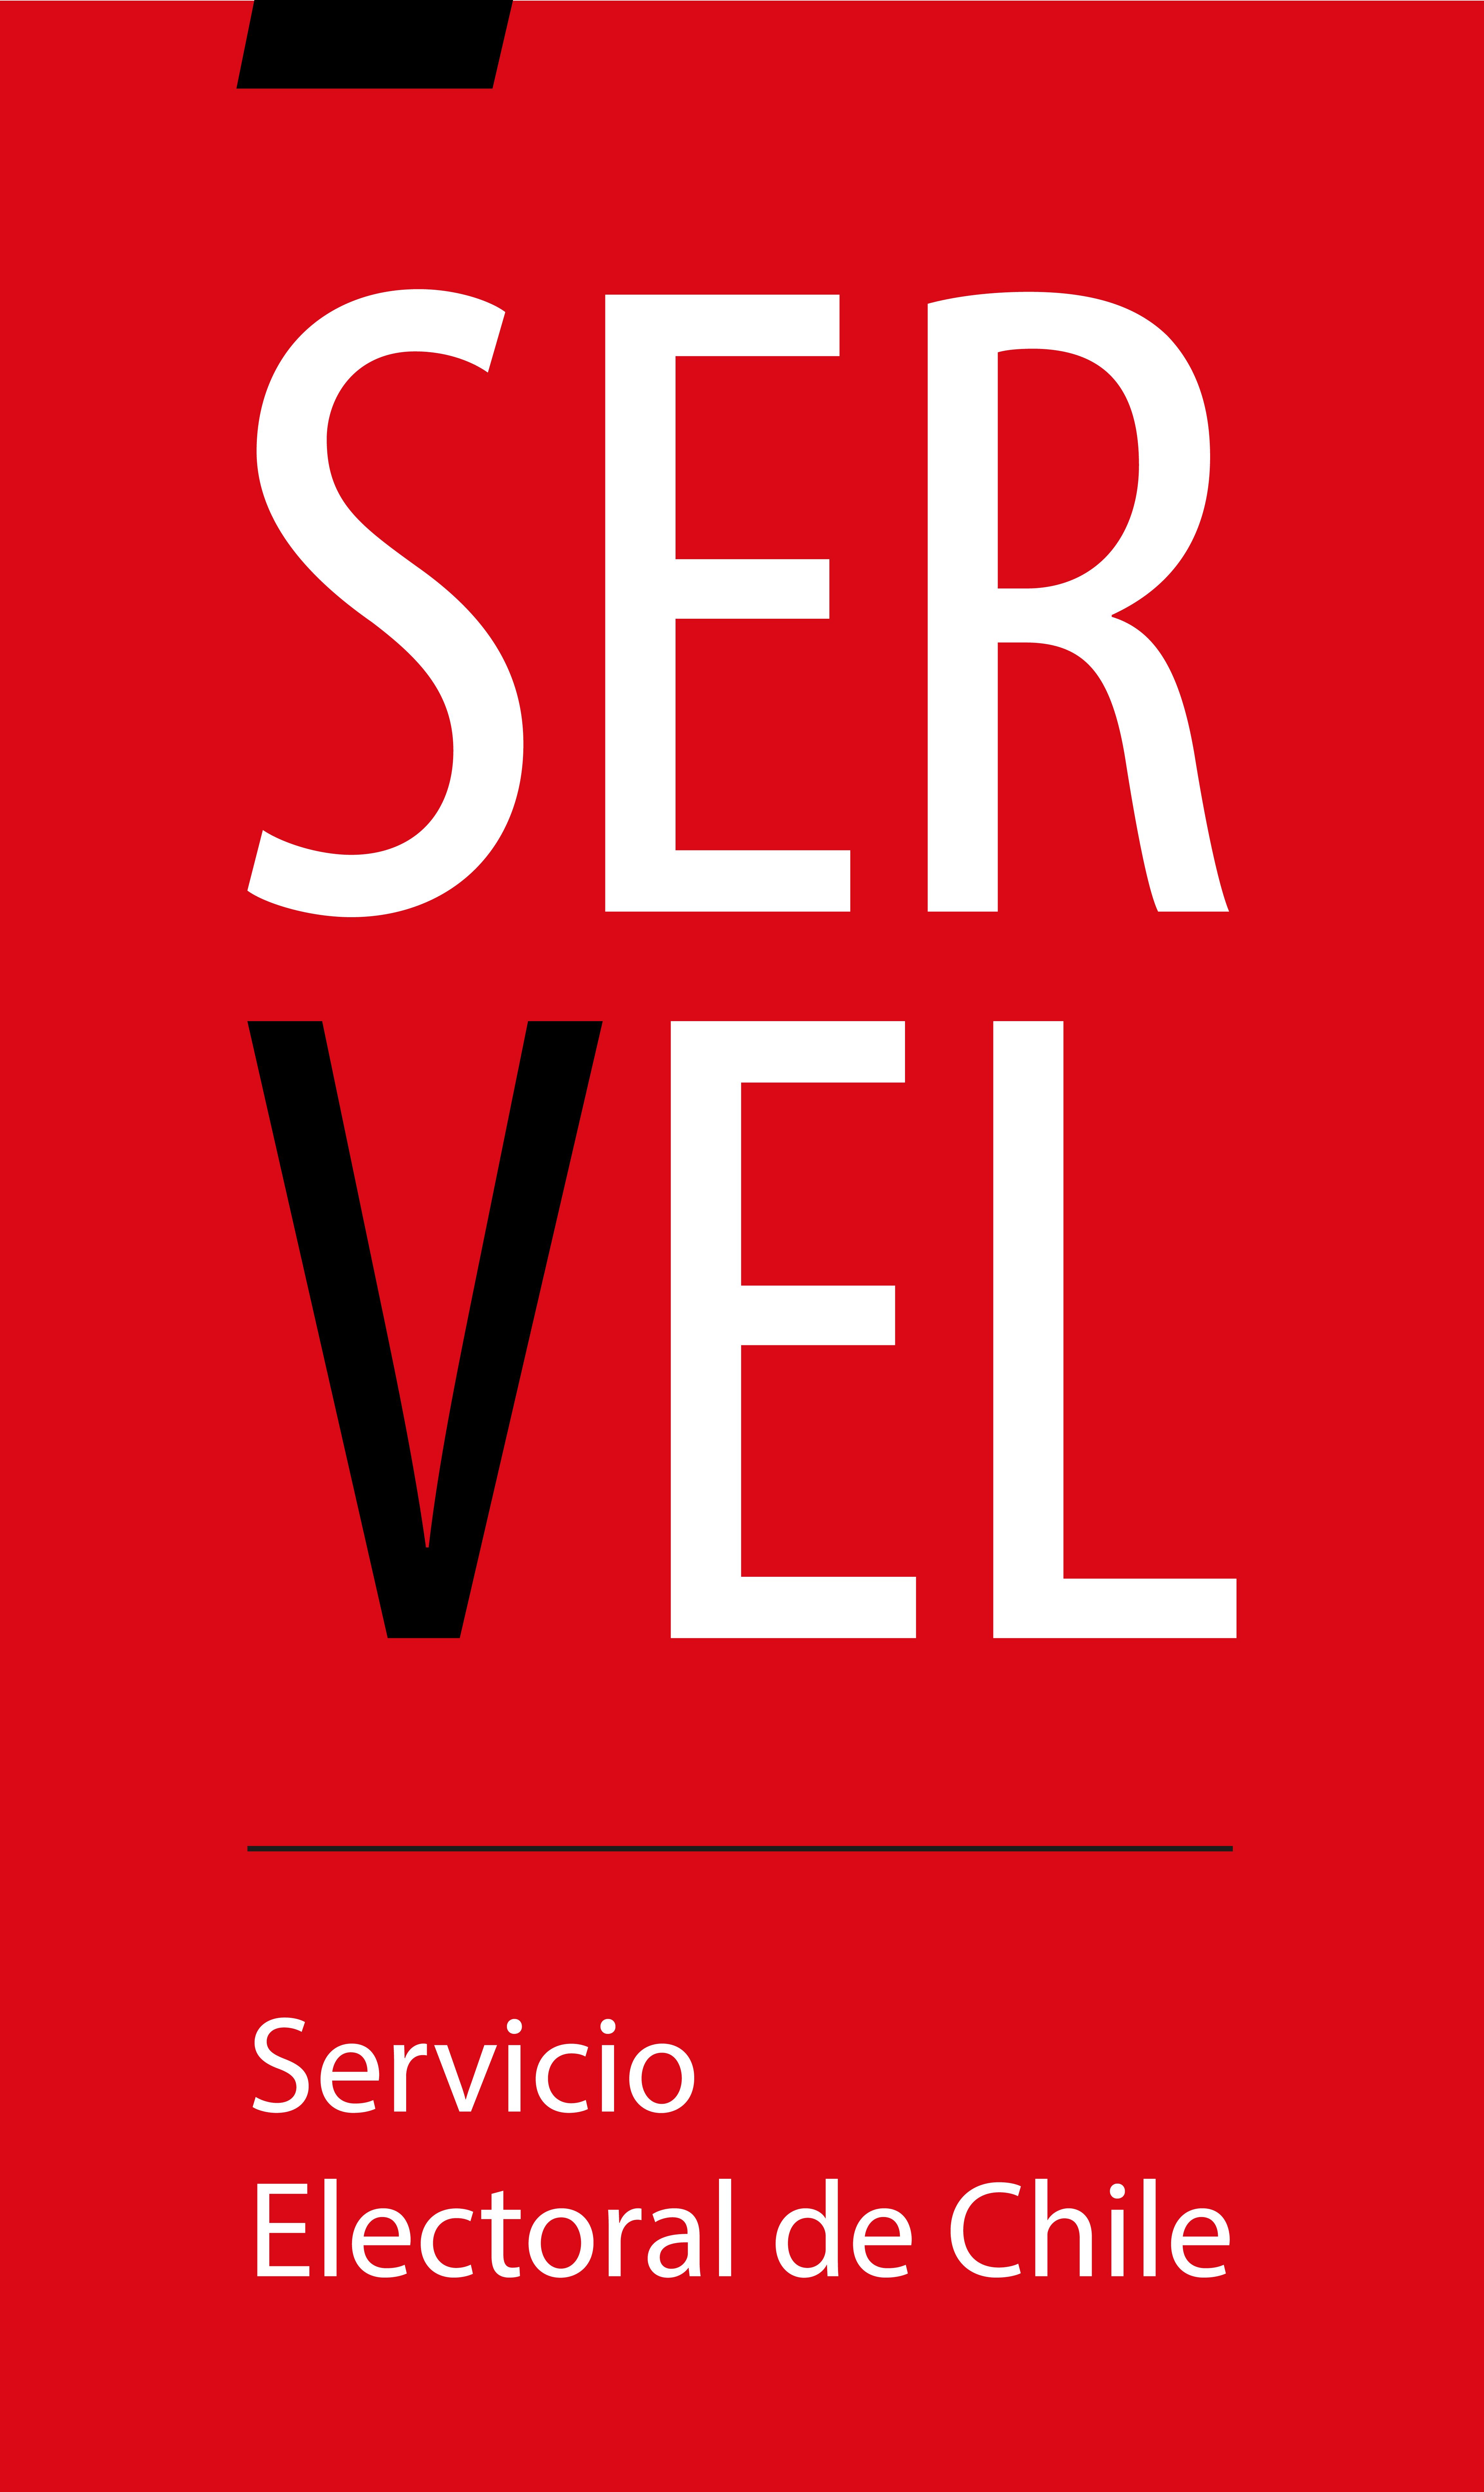 logo Servel_Logo fondo rojo